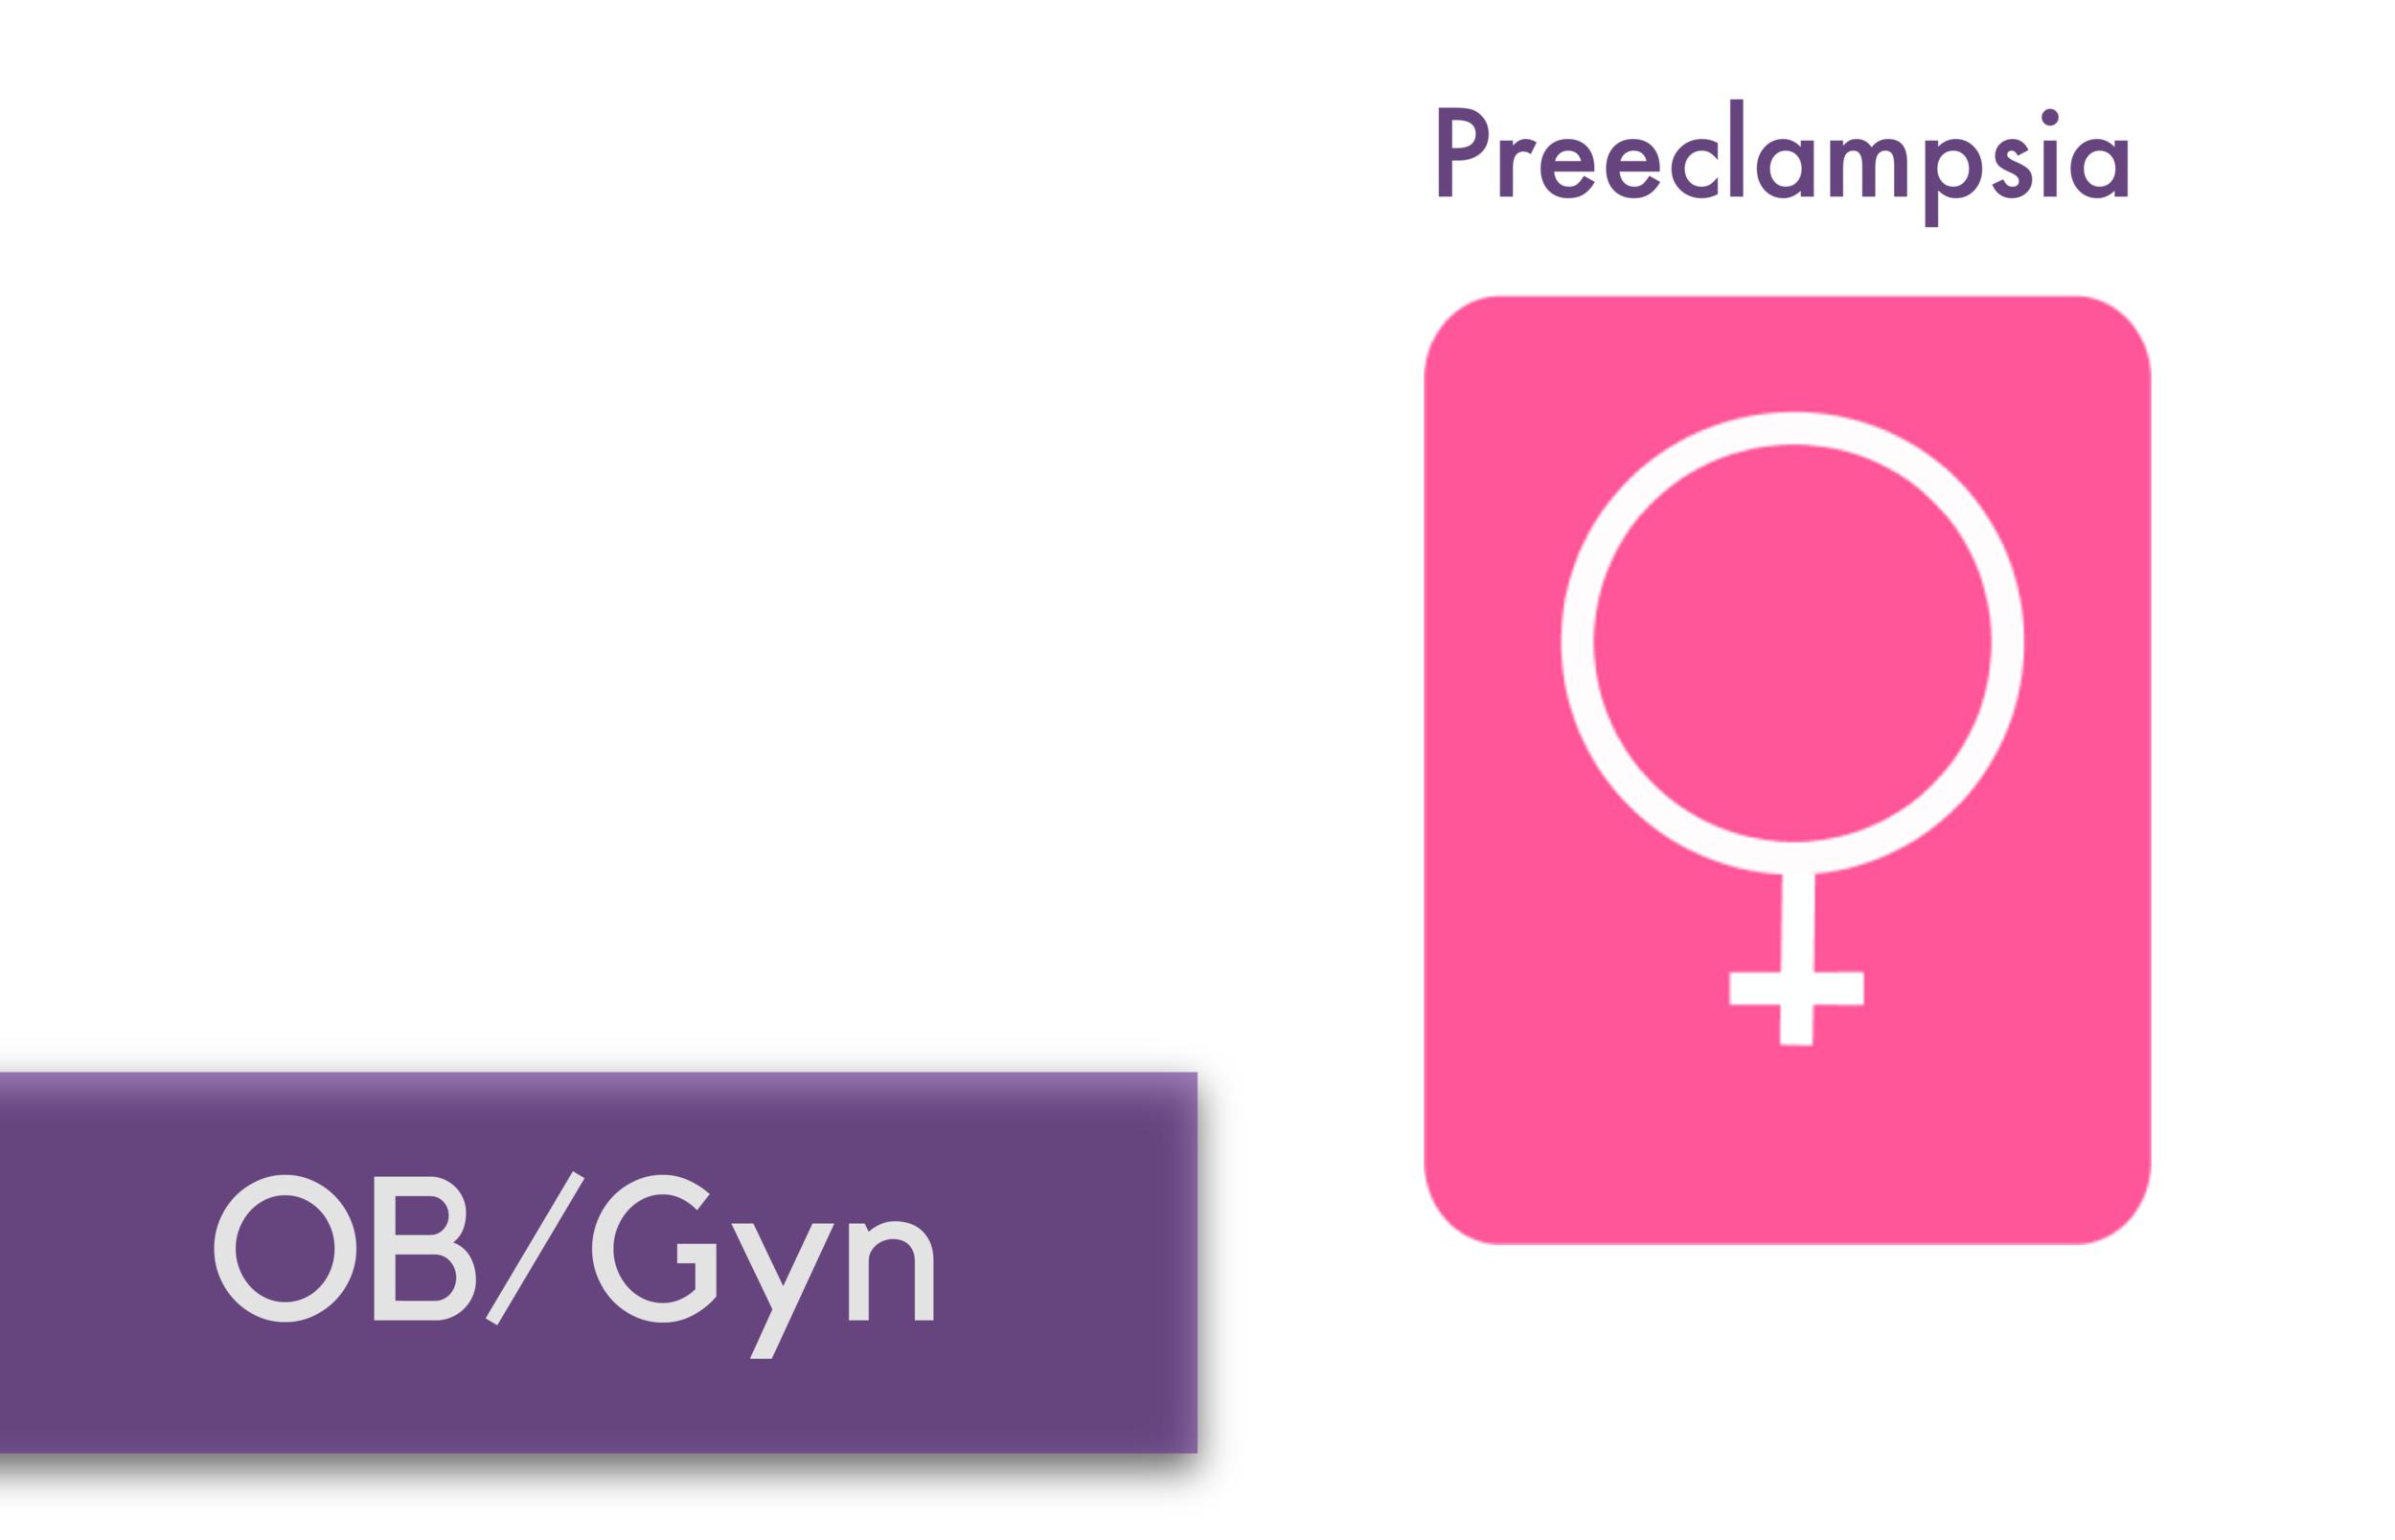 preeclampsia image.png